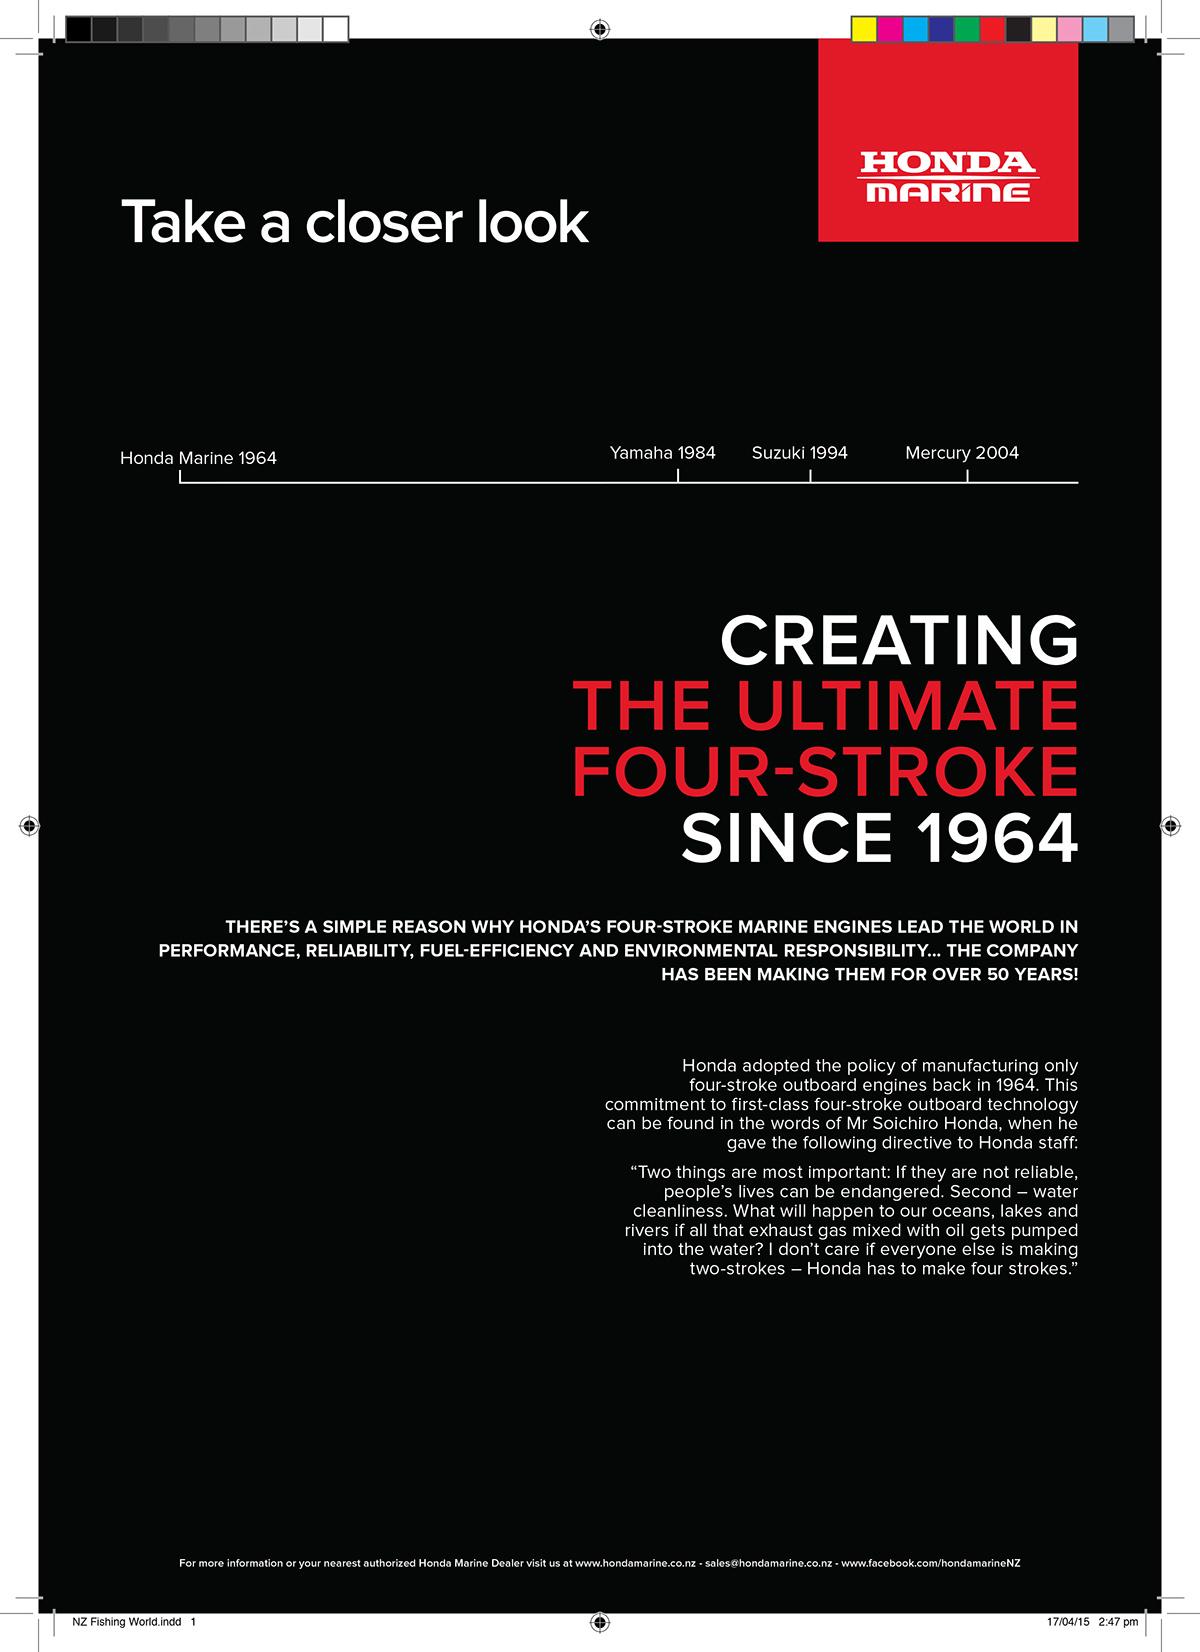 Honda Marine Brand Education Campaign Print Media On Behance